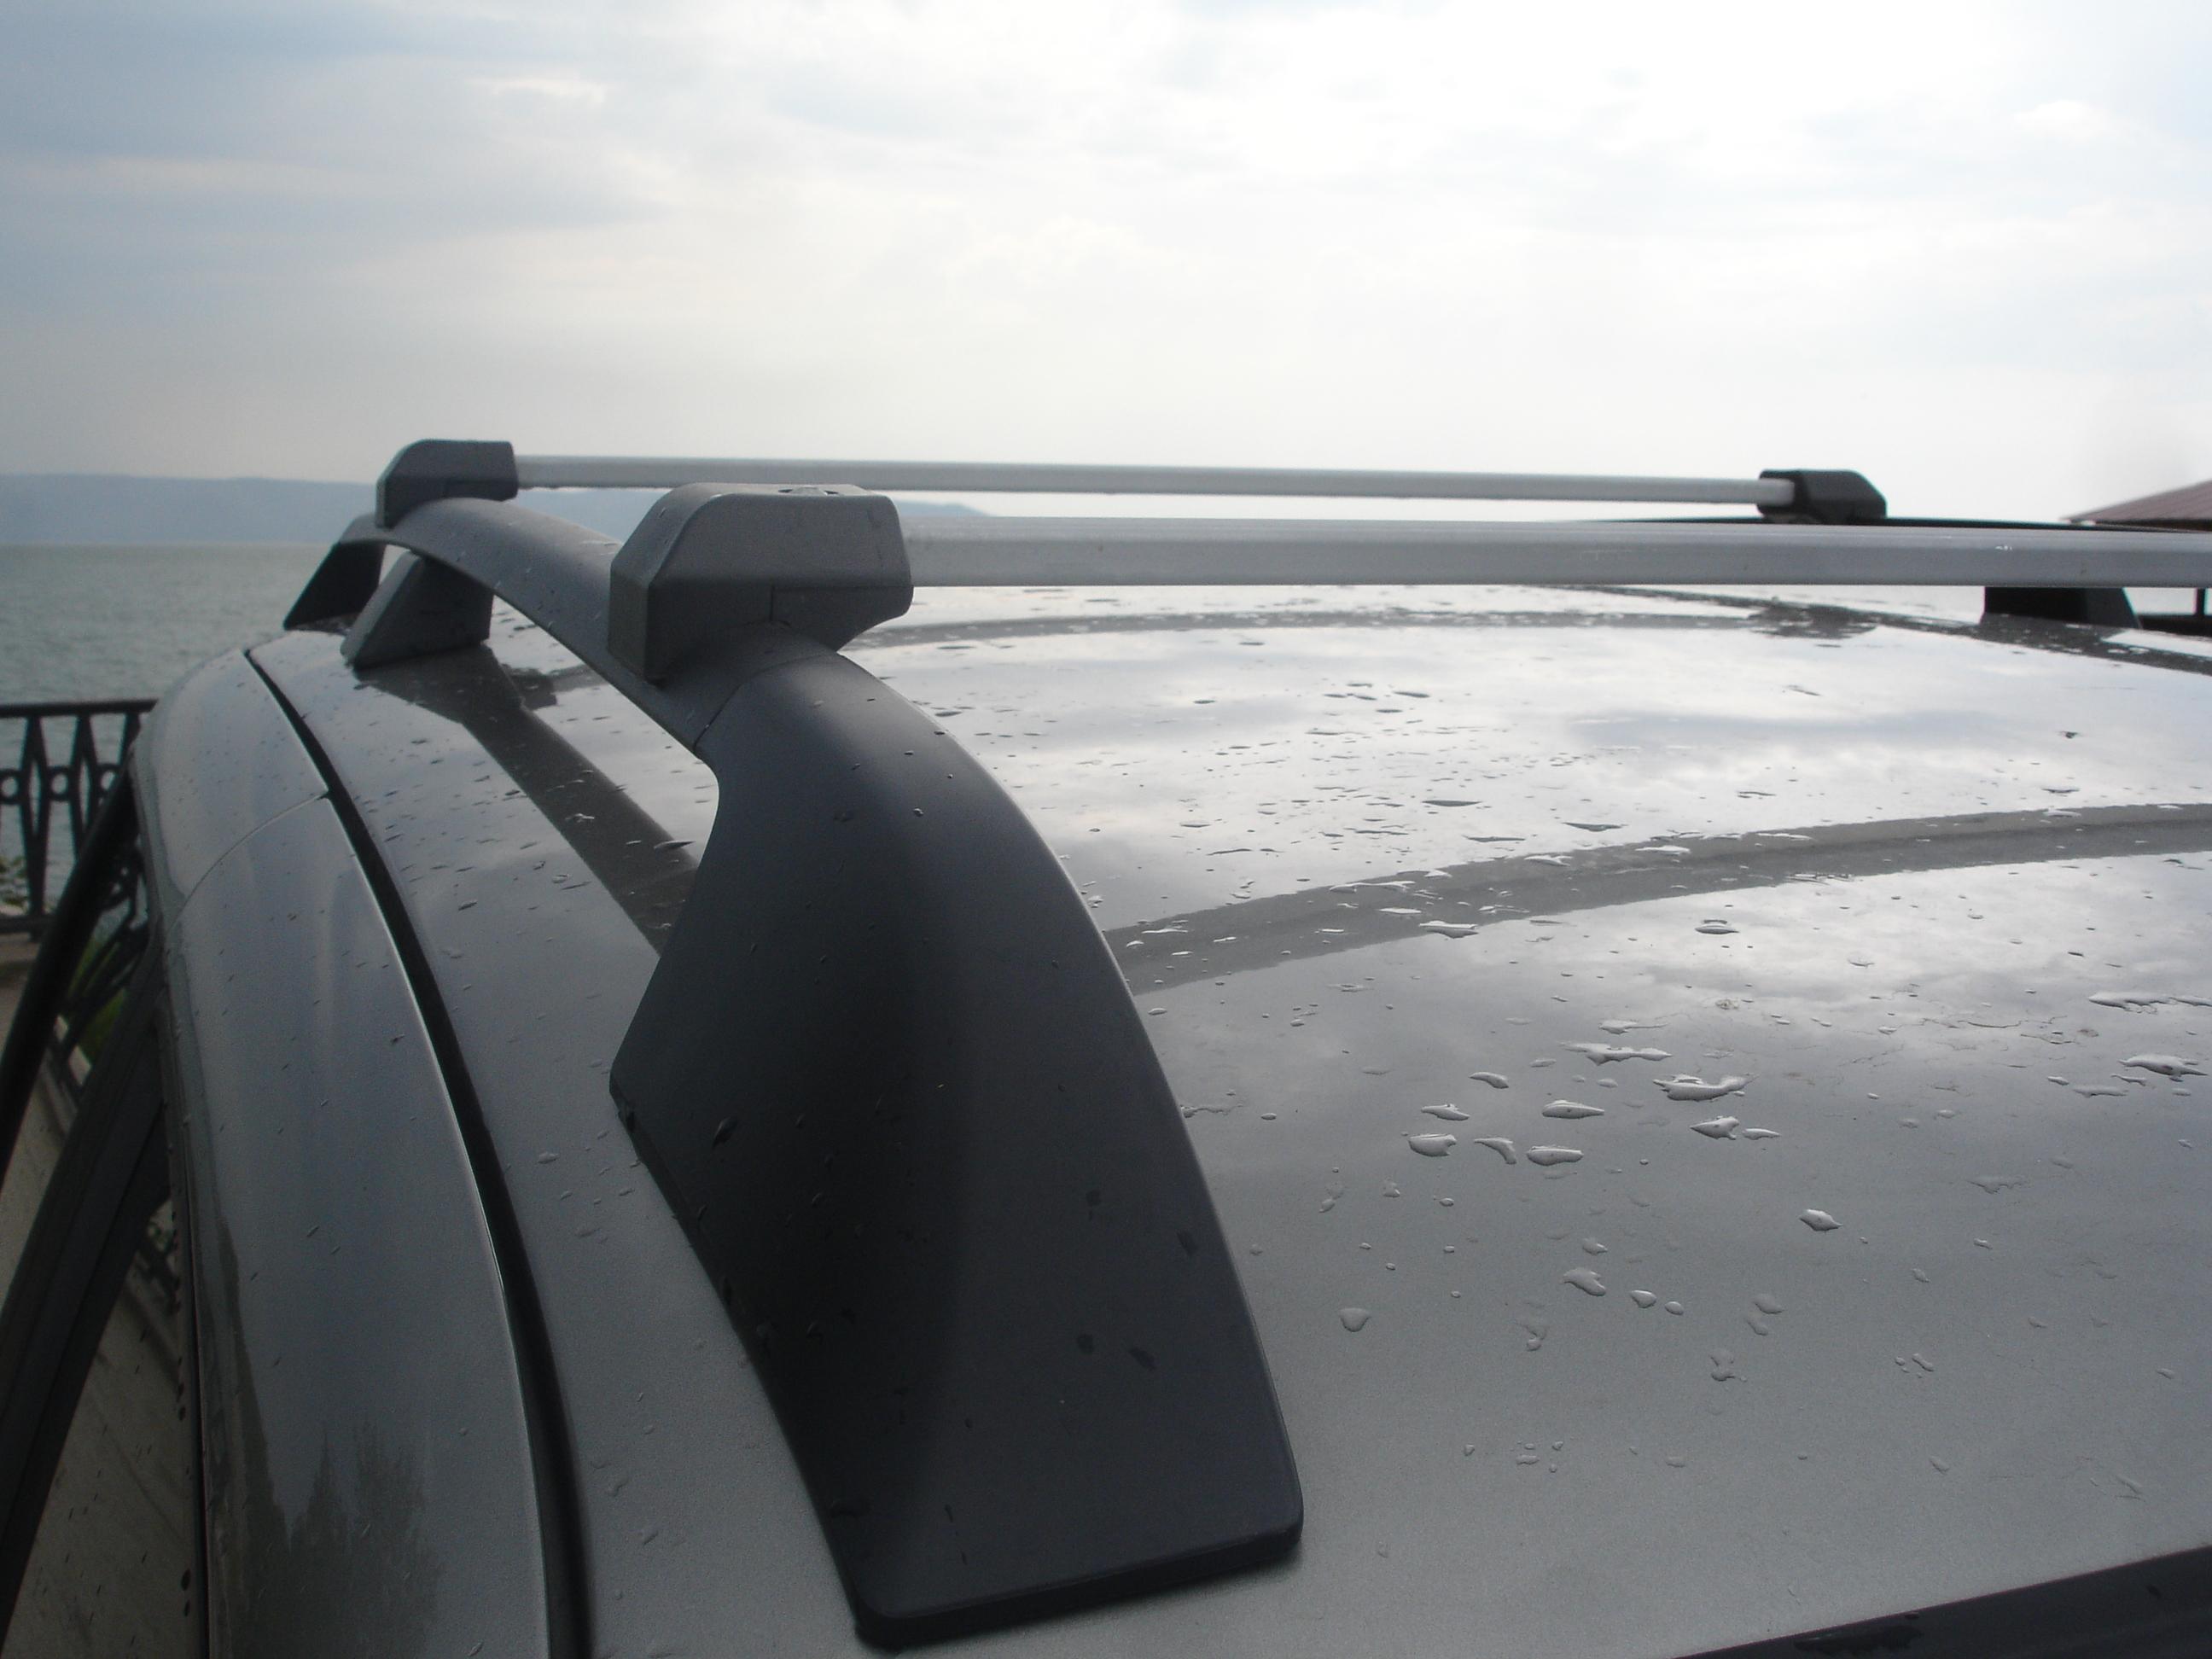 fl s Багажник на крышу на Датсун он До и ми До: обзор цен и производителей